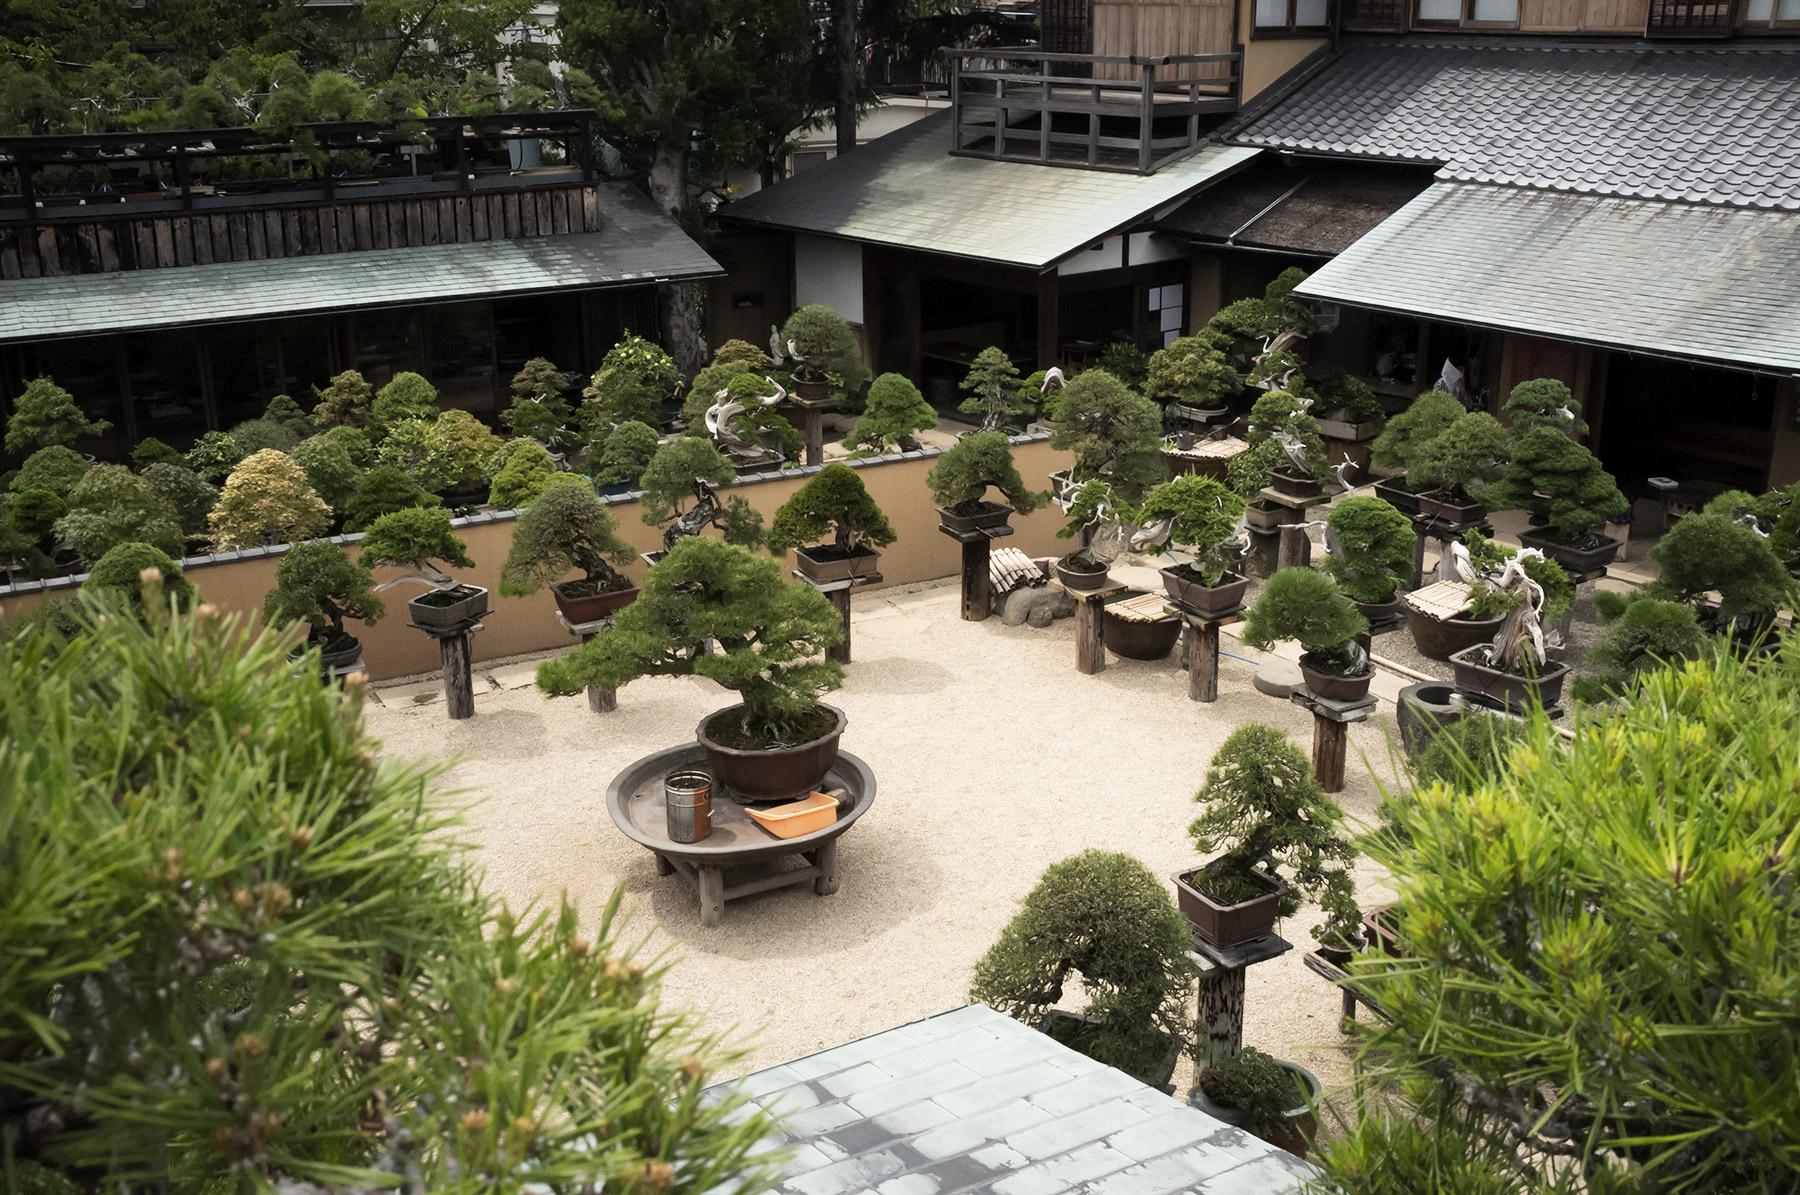 Tokyo bonsai museum Shunkaen